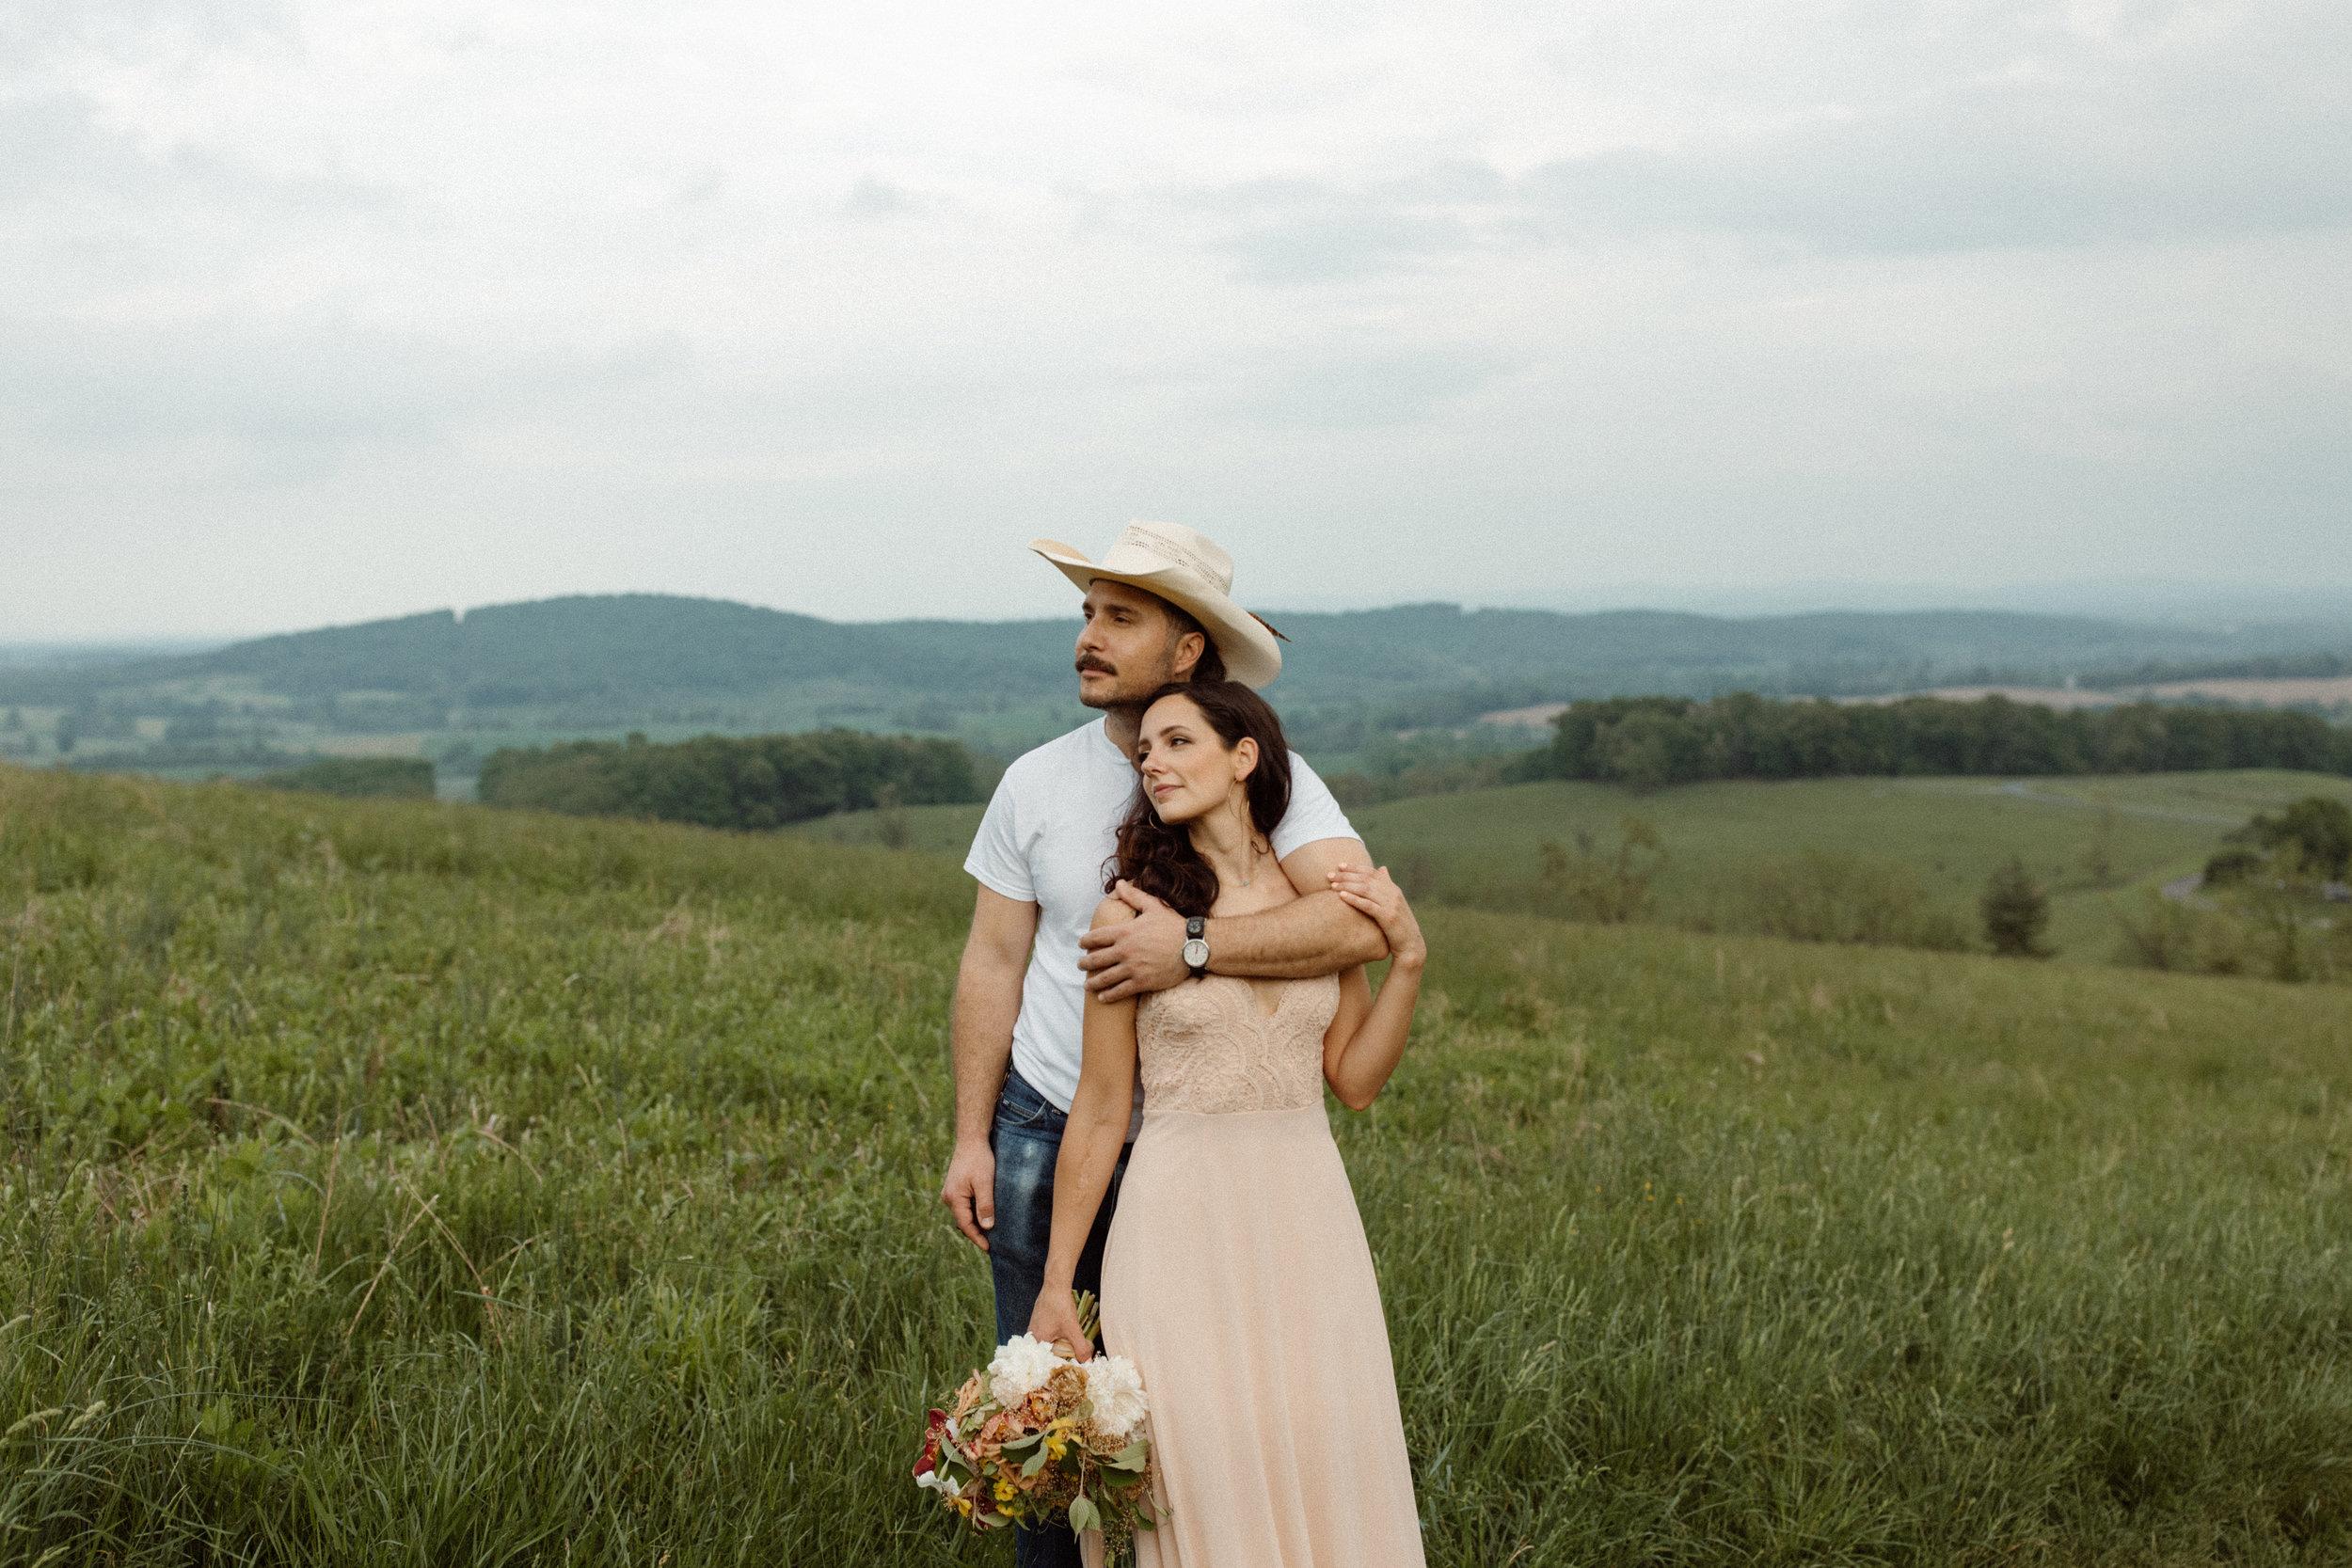 kelsey&mark-engagement-skymeadows-2019-peytoncurry-9315.jpg